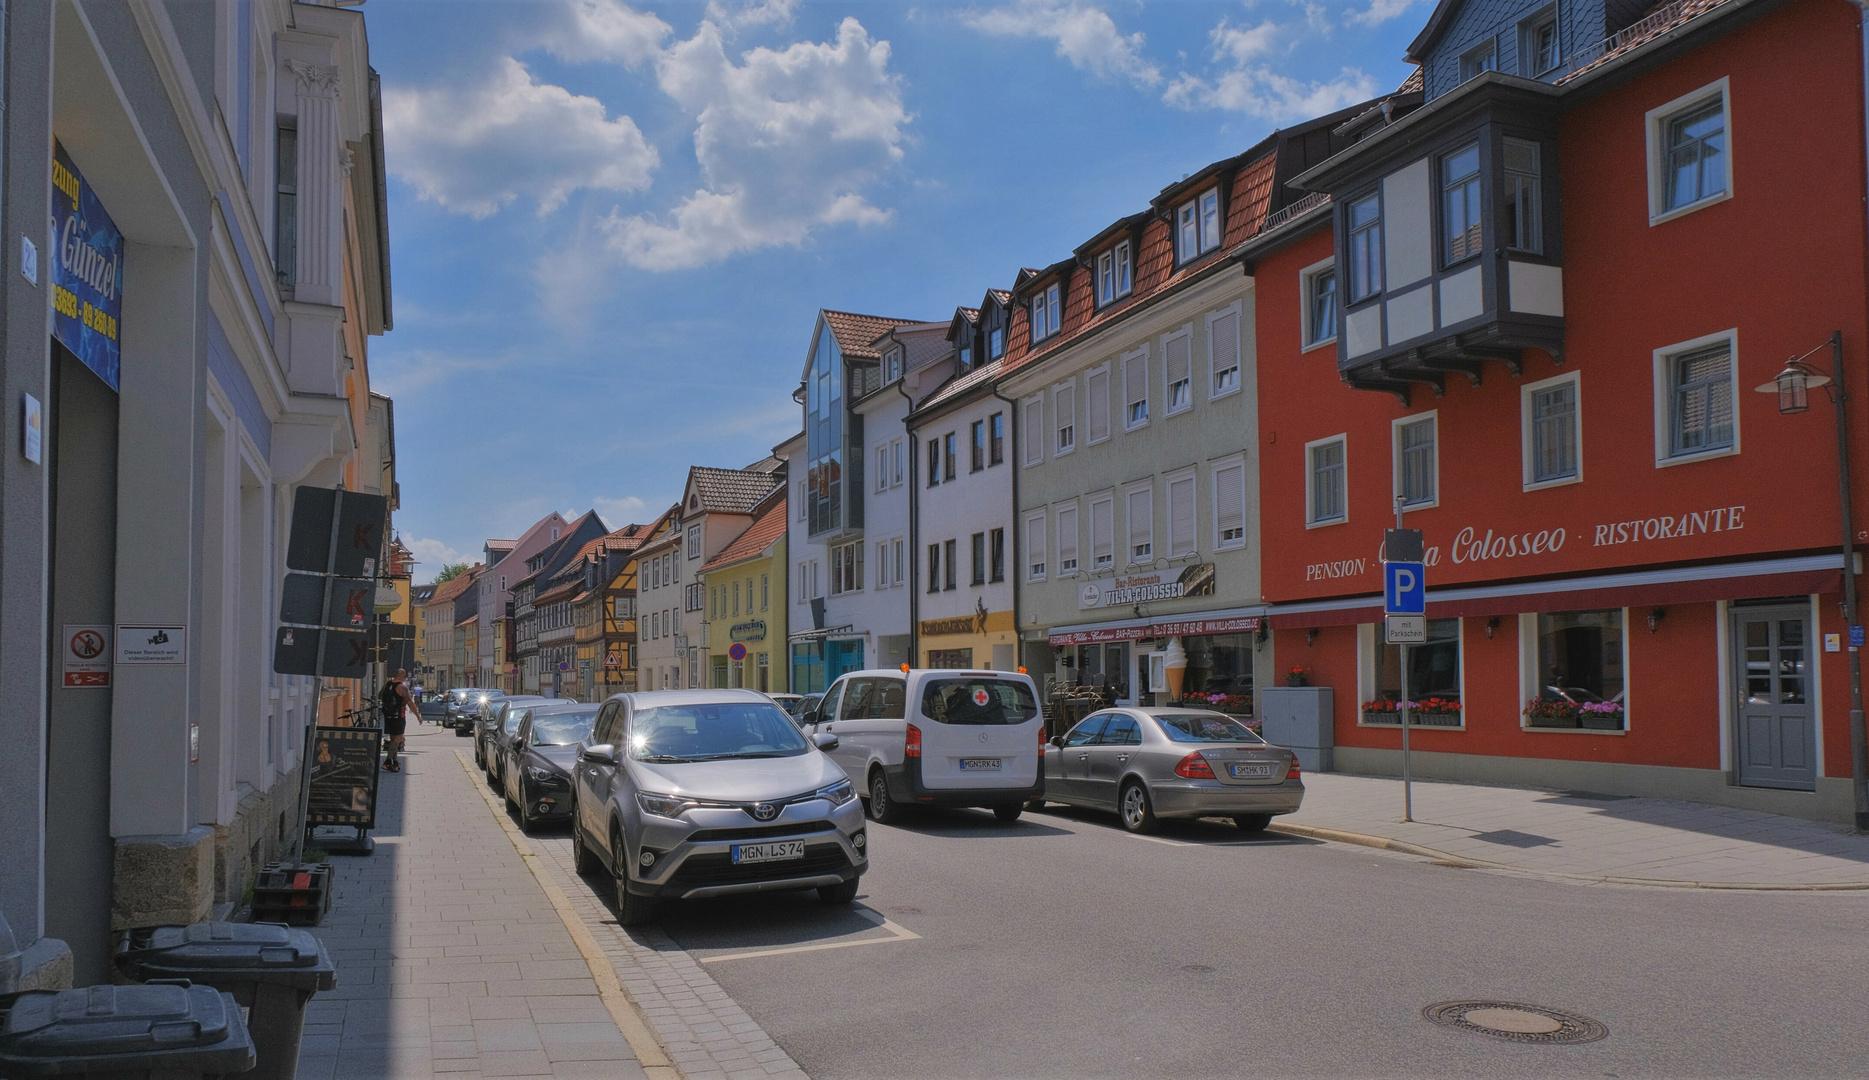 Meininger Ansicht, 5 (un motivo de Meiningen, 5)